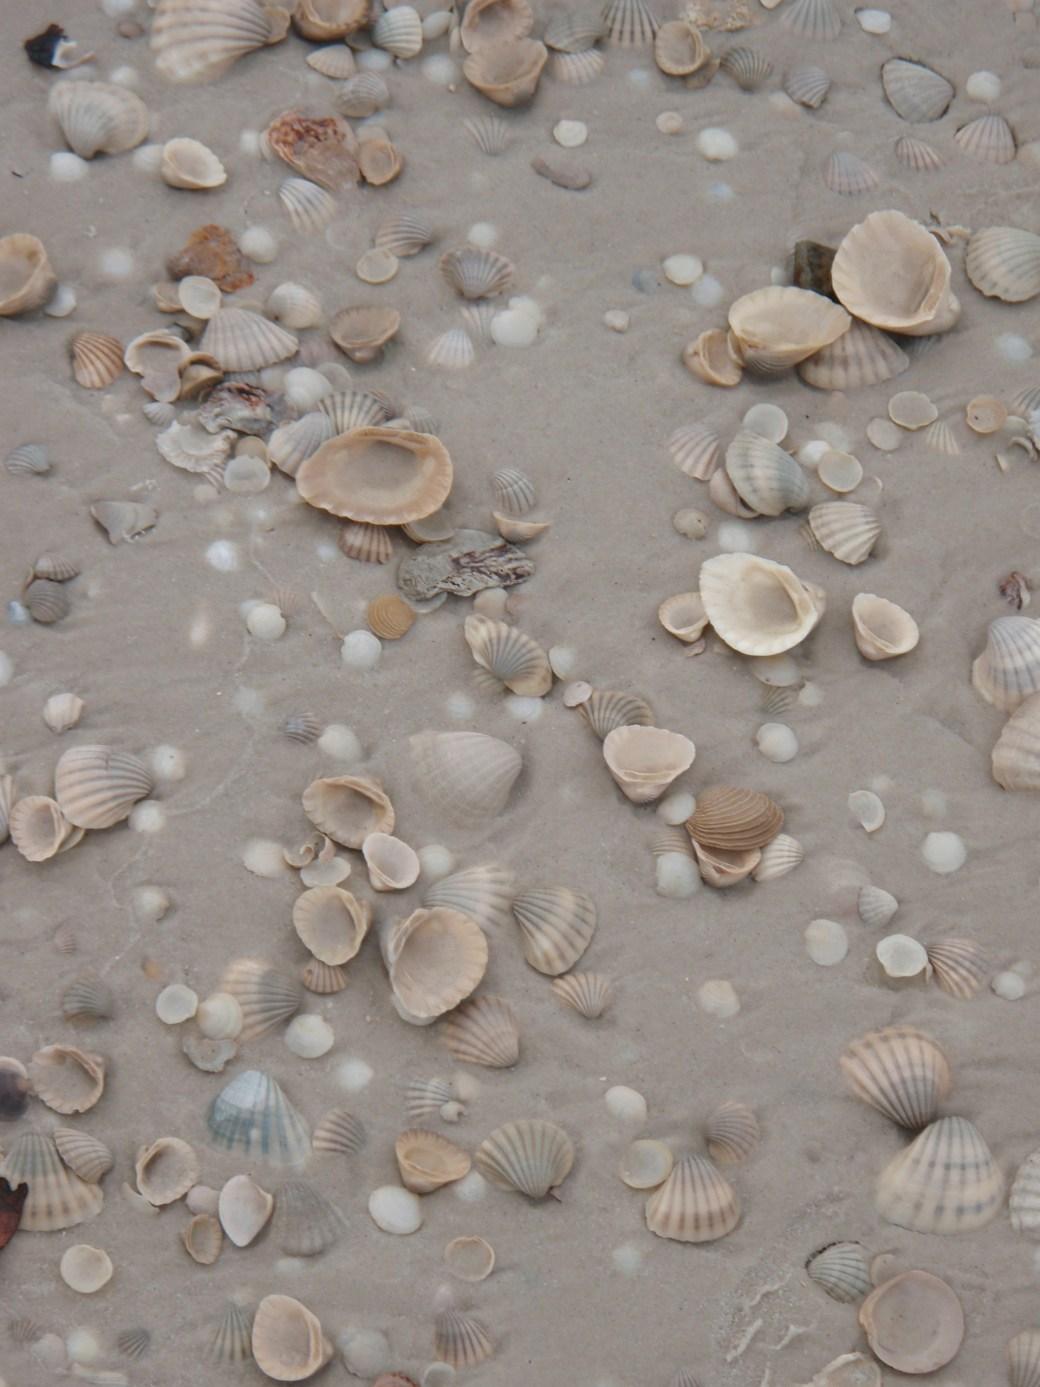 Shells on the Beach; Port Gentil, Gabon; 2010